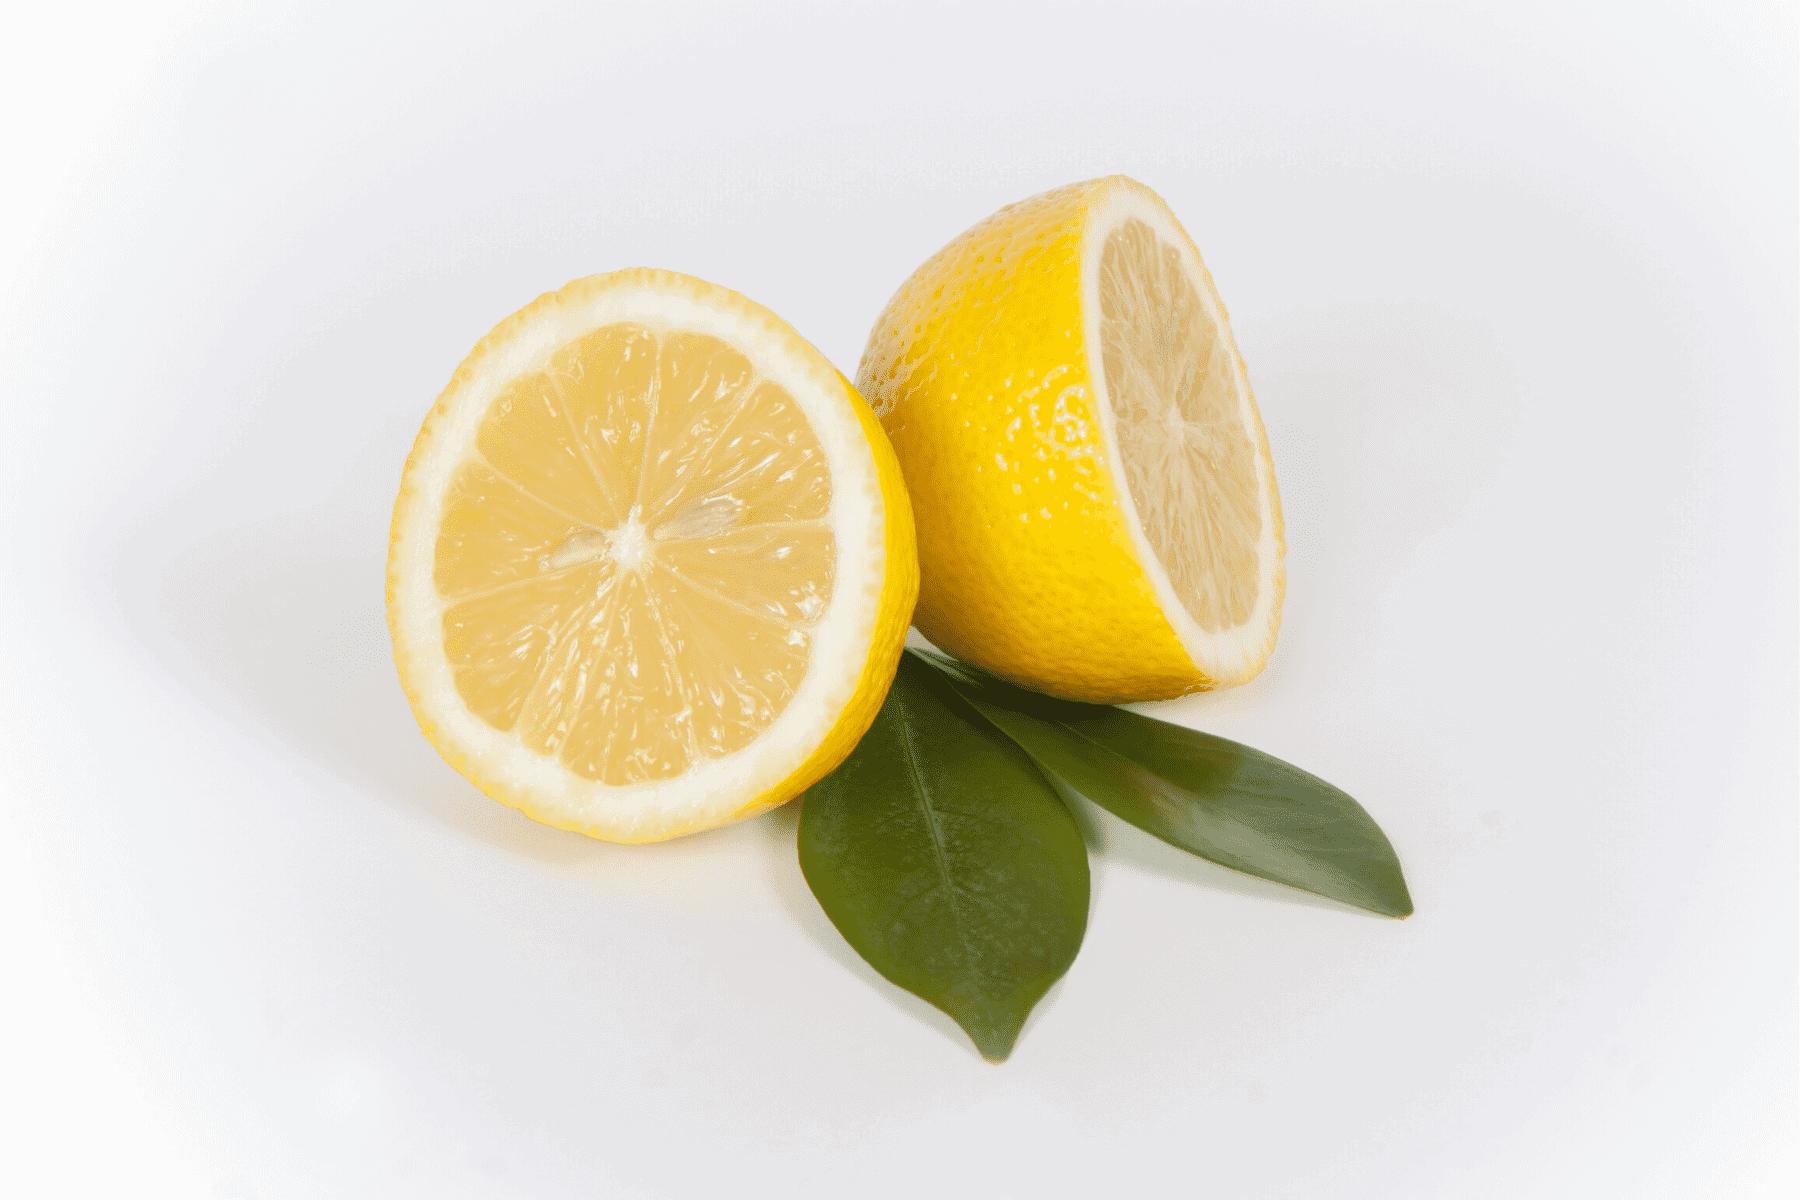 Close up of sliced lemons